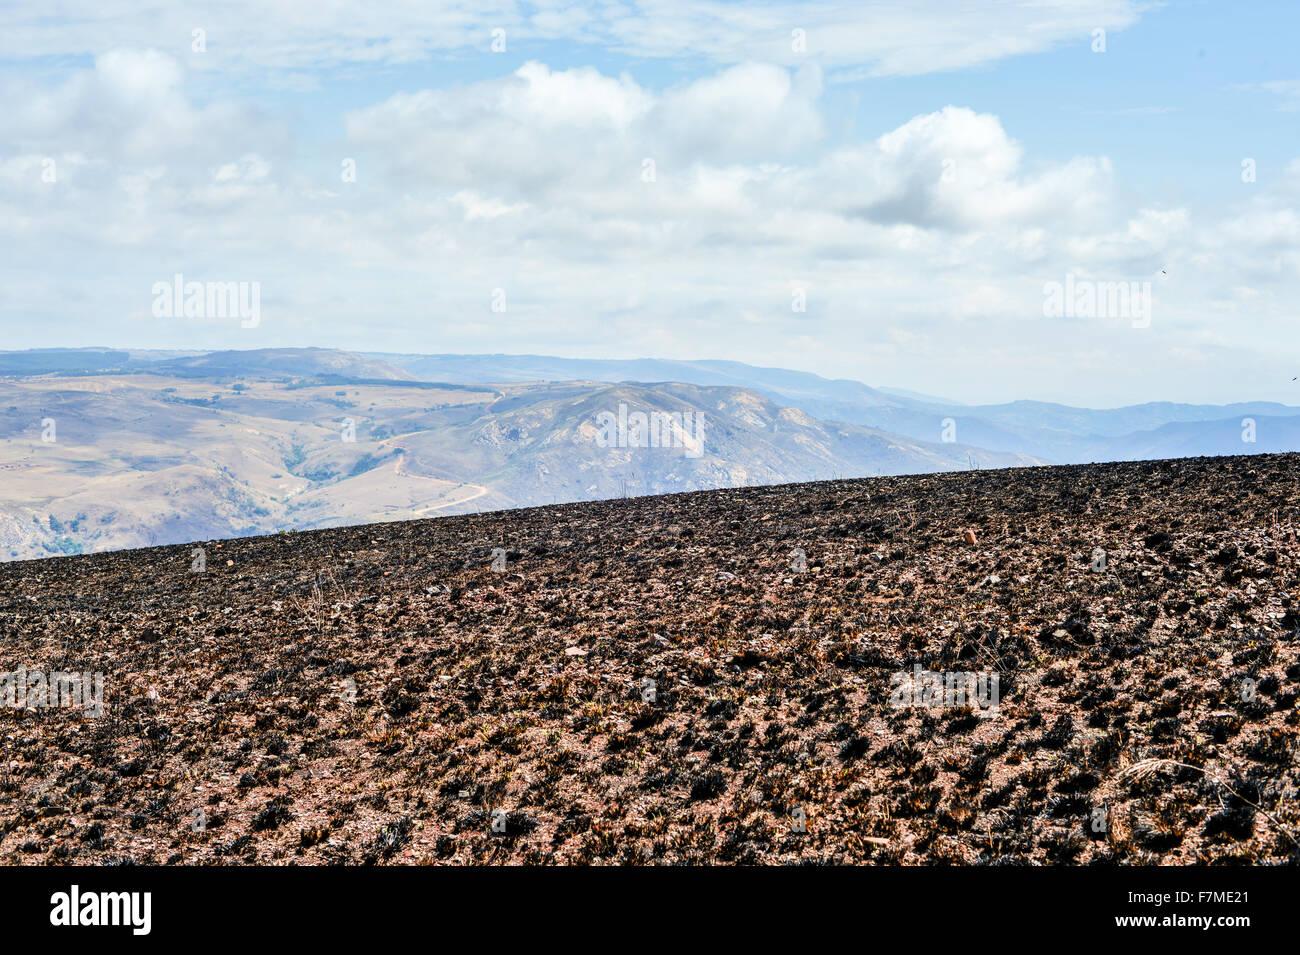 Scorched Landscape in Hhohho, Swaziland outside of Ngwenya Iron Ore Mine. - Stock Image